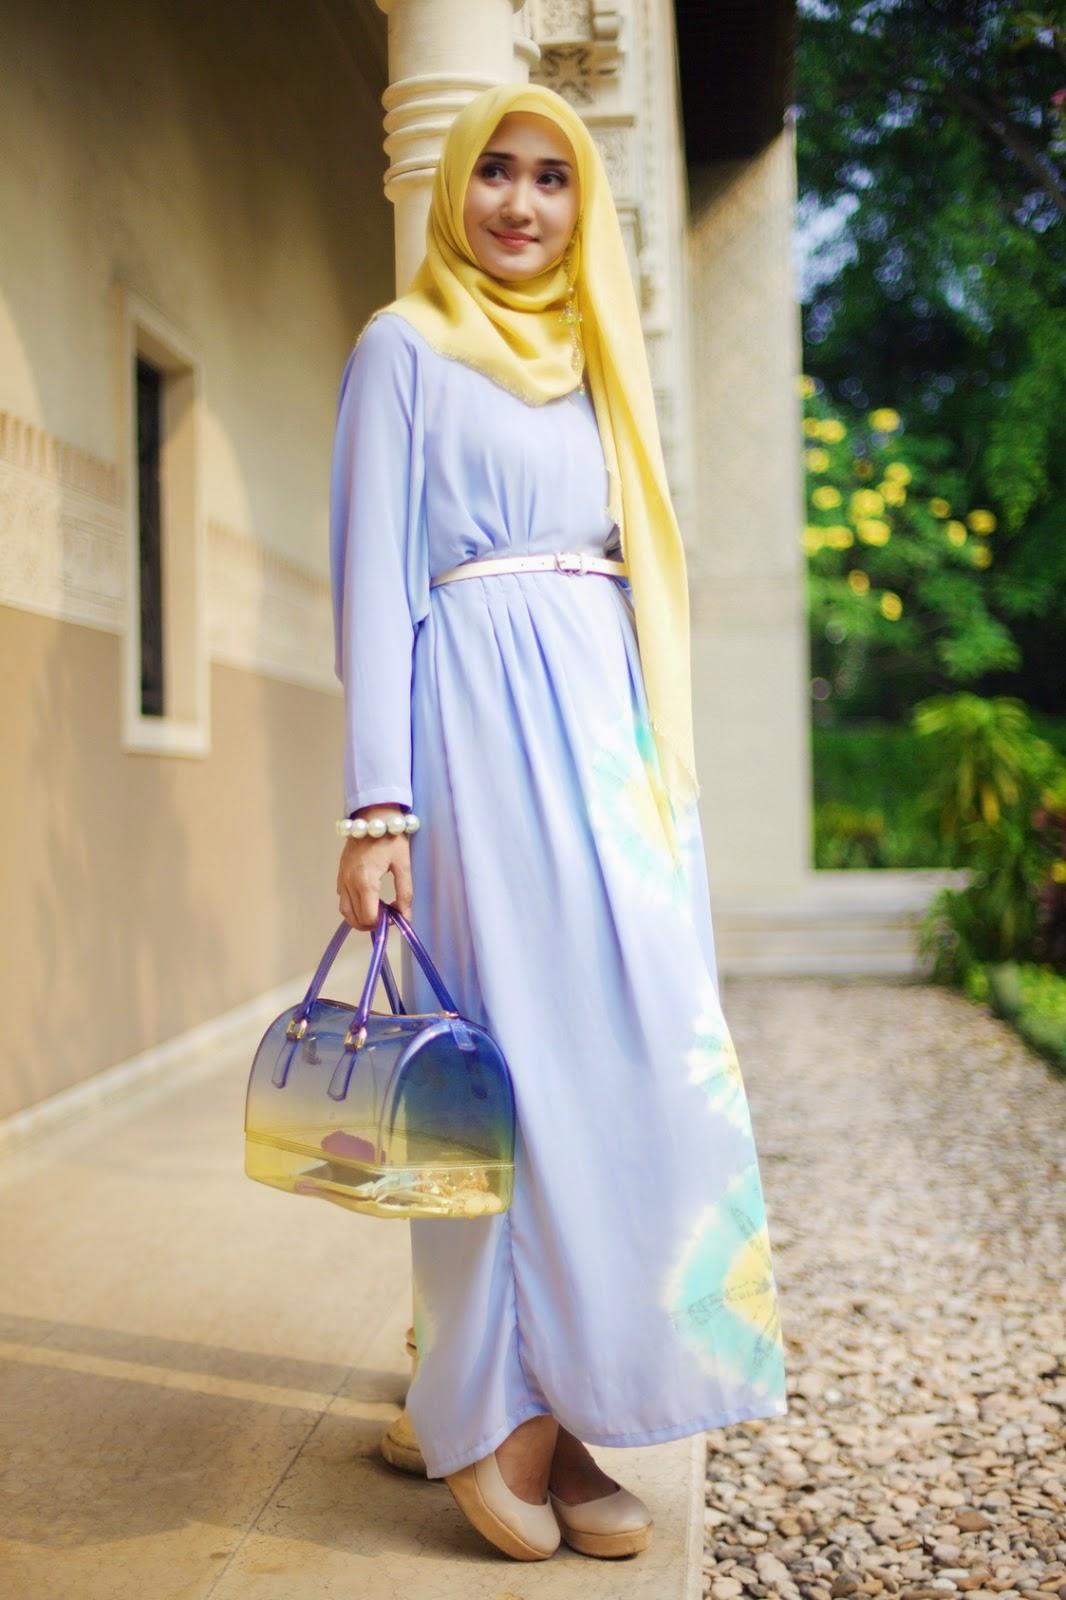 2acf8fe94 رمزيات بنات بالحجاب 2019 اجمل صور حجاب و رمزيات بنات محجبة